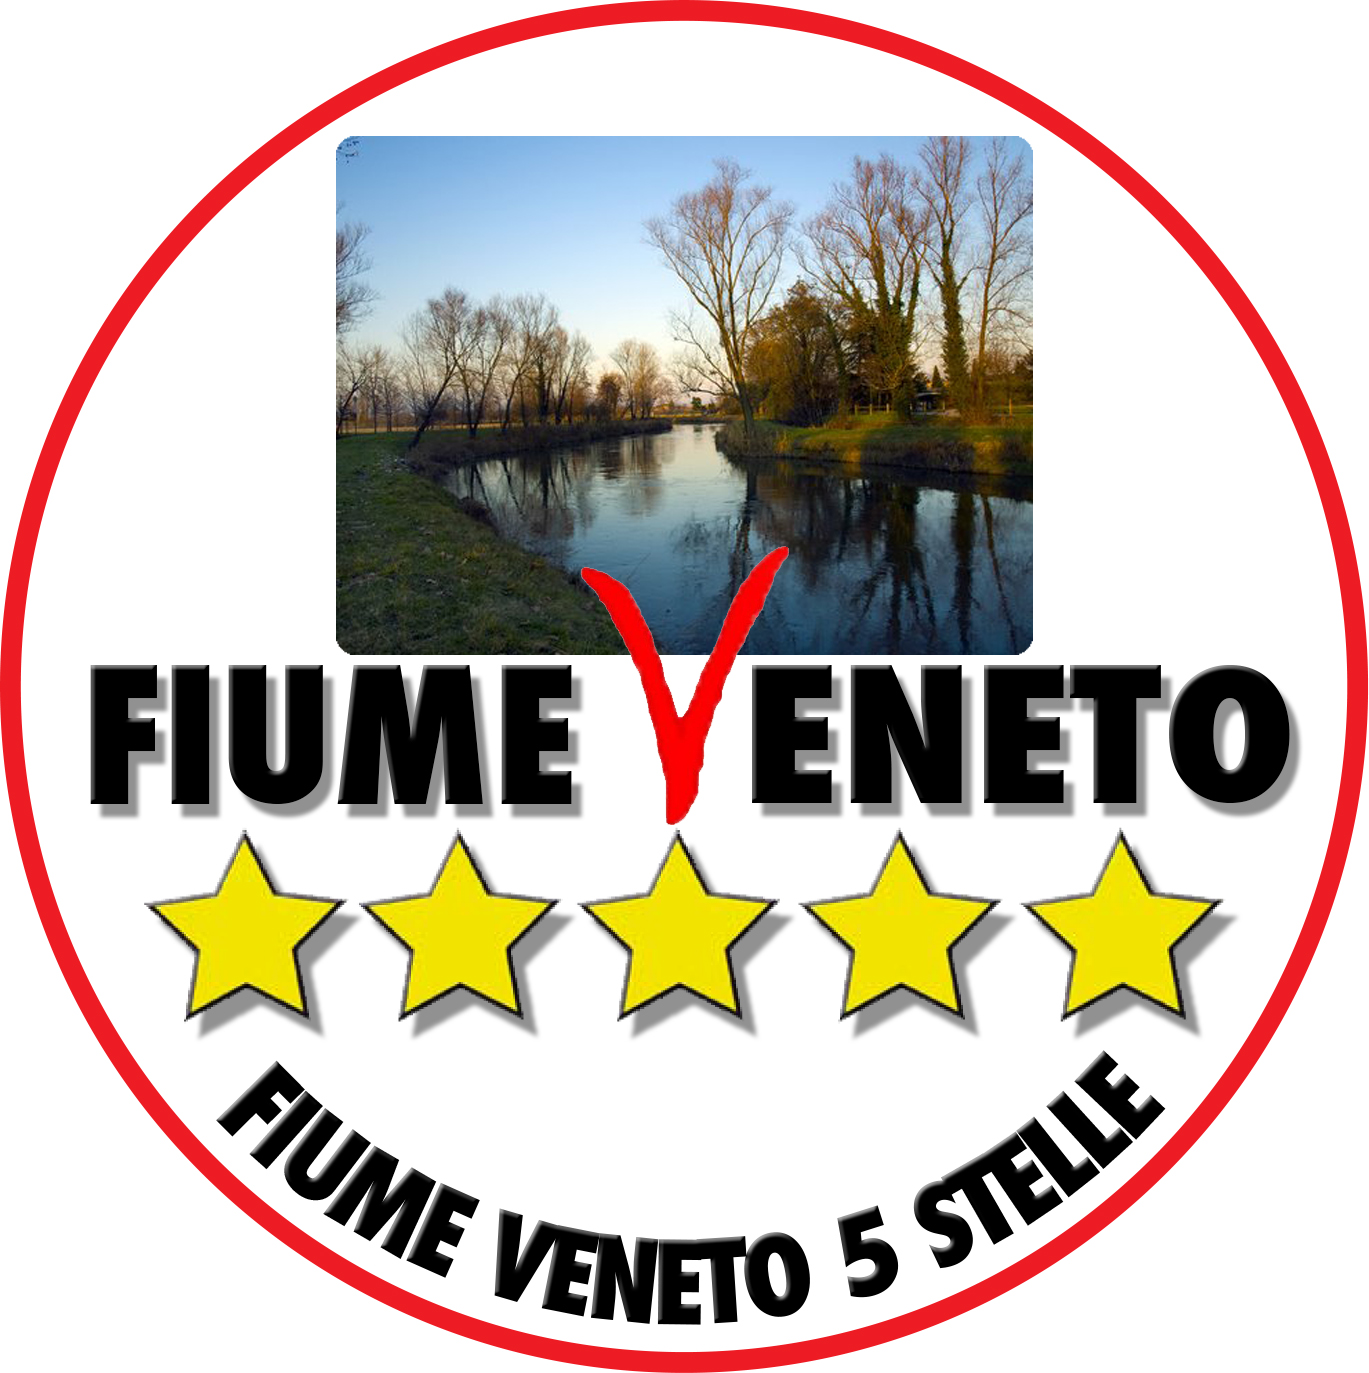 FIUME VENETO 5 STELLE